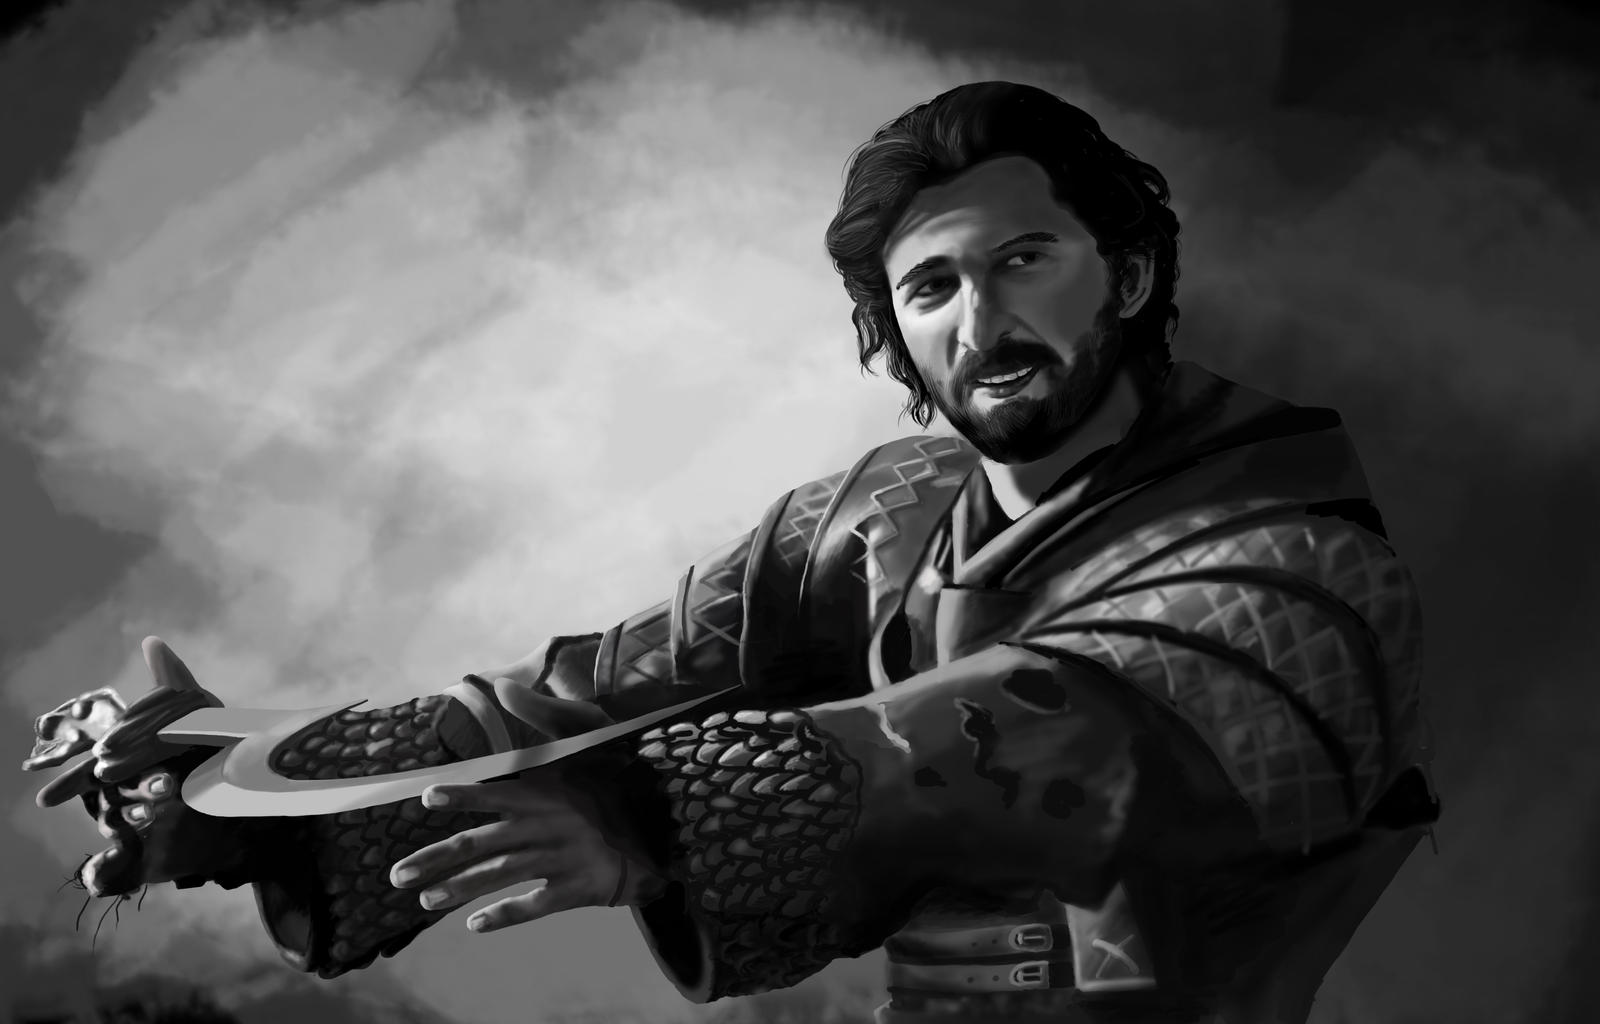 Daario Naharis by Adoron on deviantART Daario Naharis Fan Art